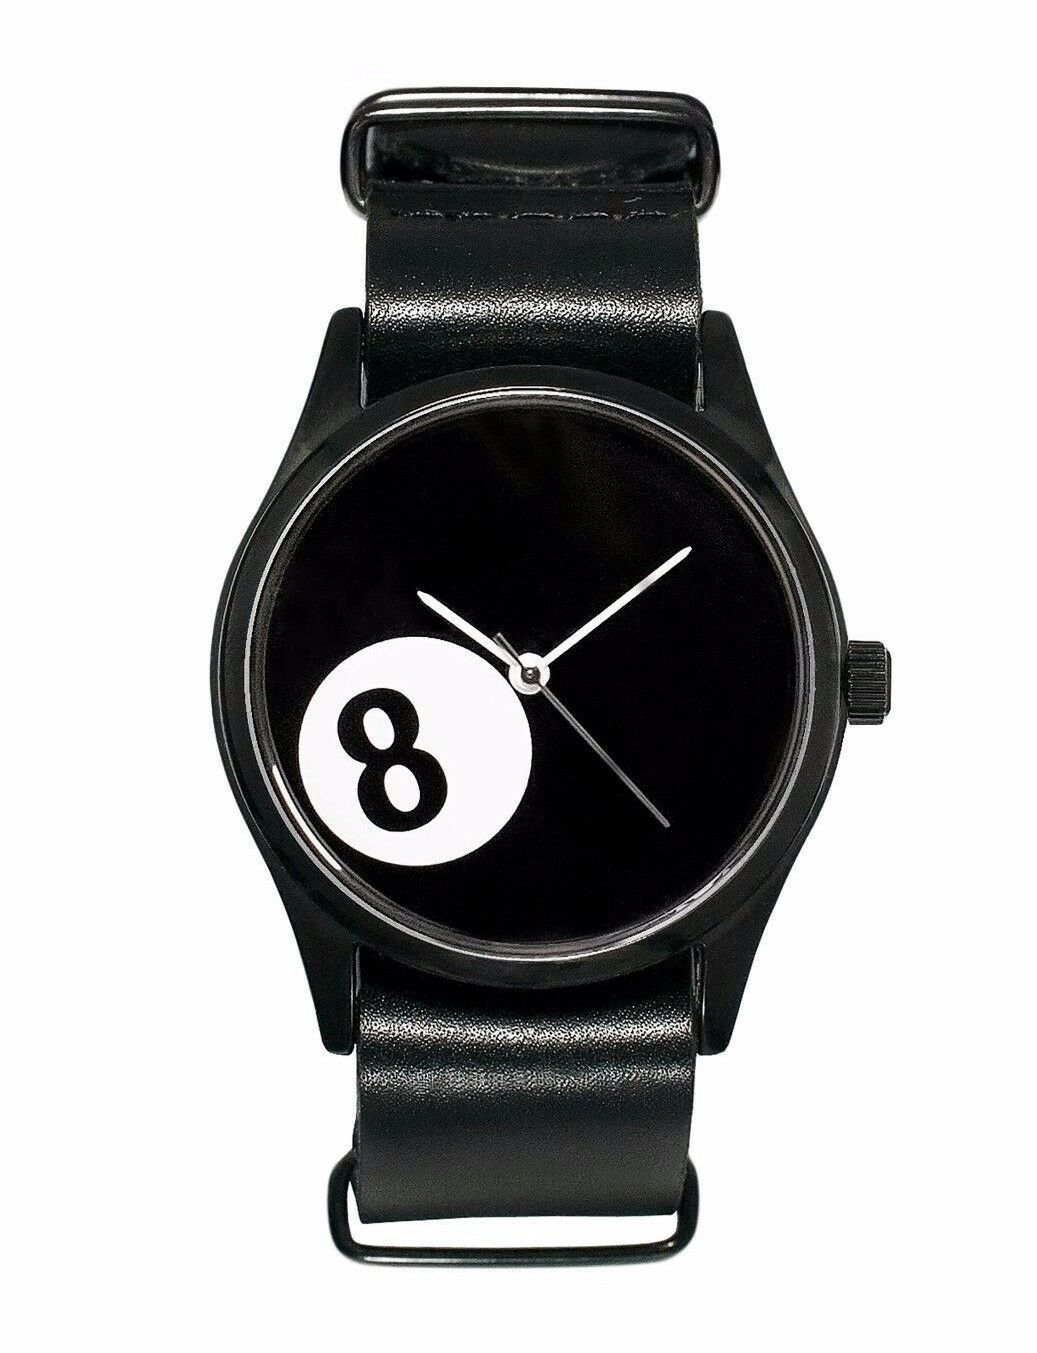 Cheapo CHPO cheapo 8 Ball Pool Black Leather Strap 14227SS Analog Wrist Watch